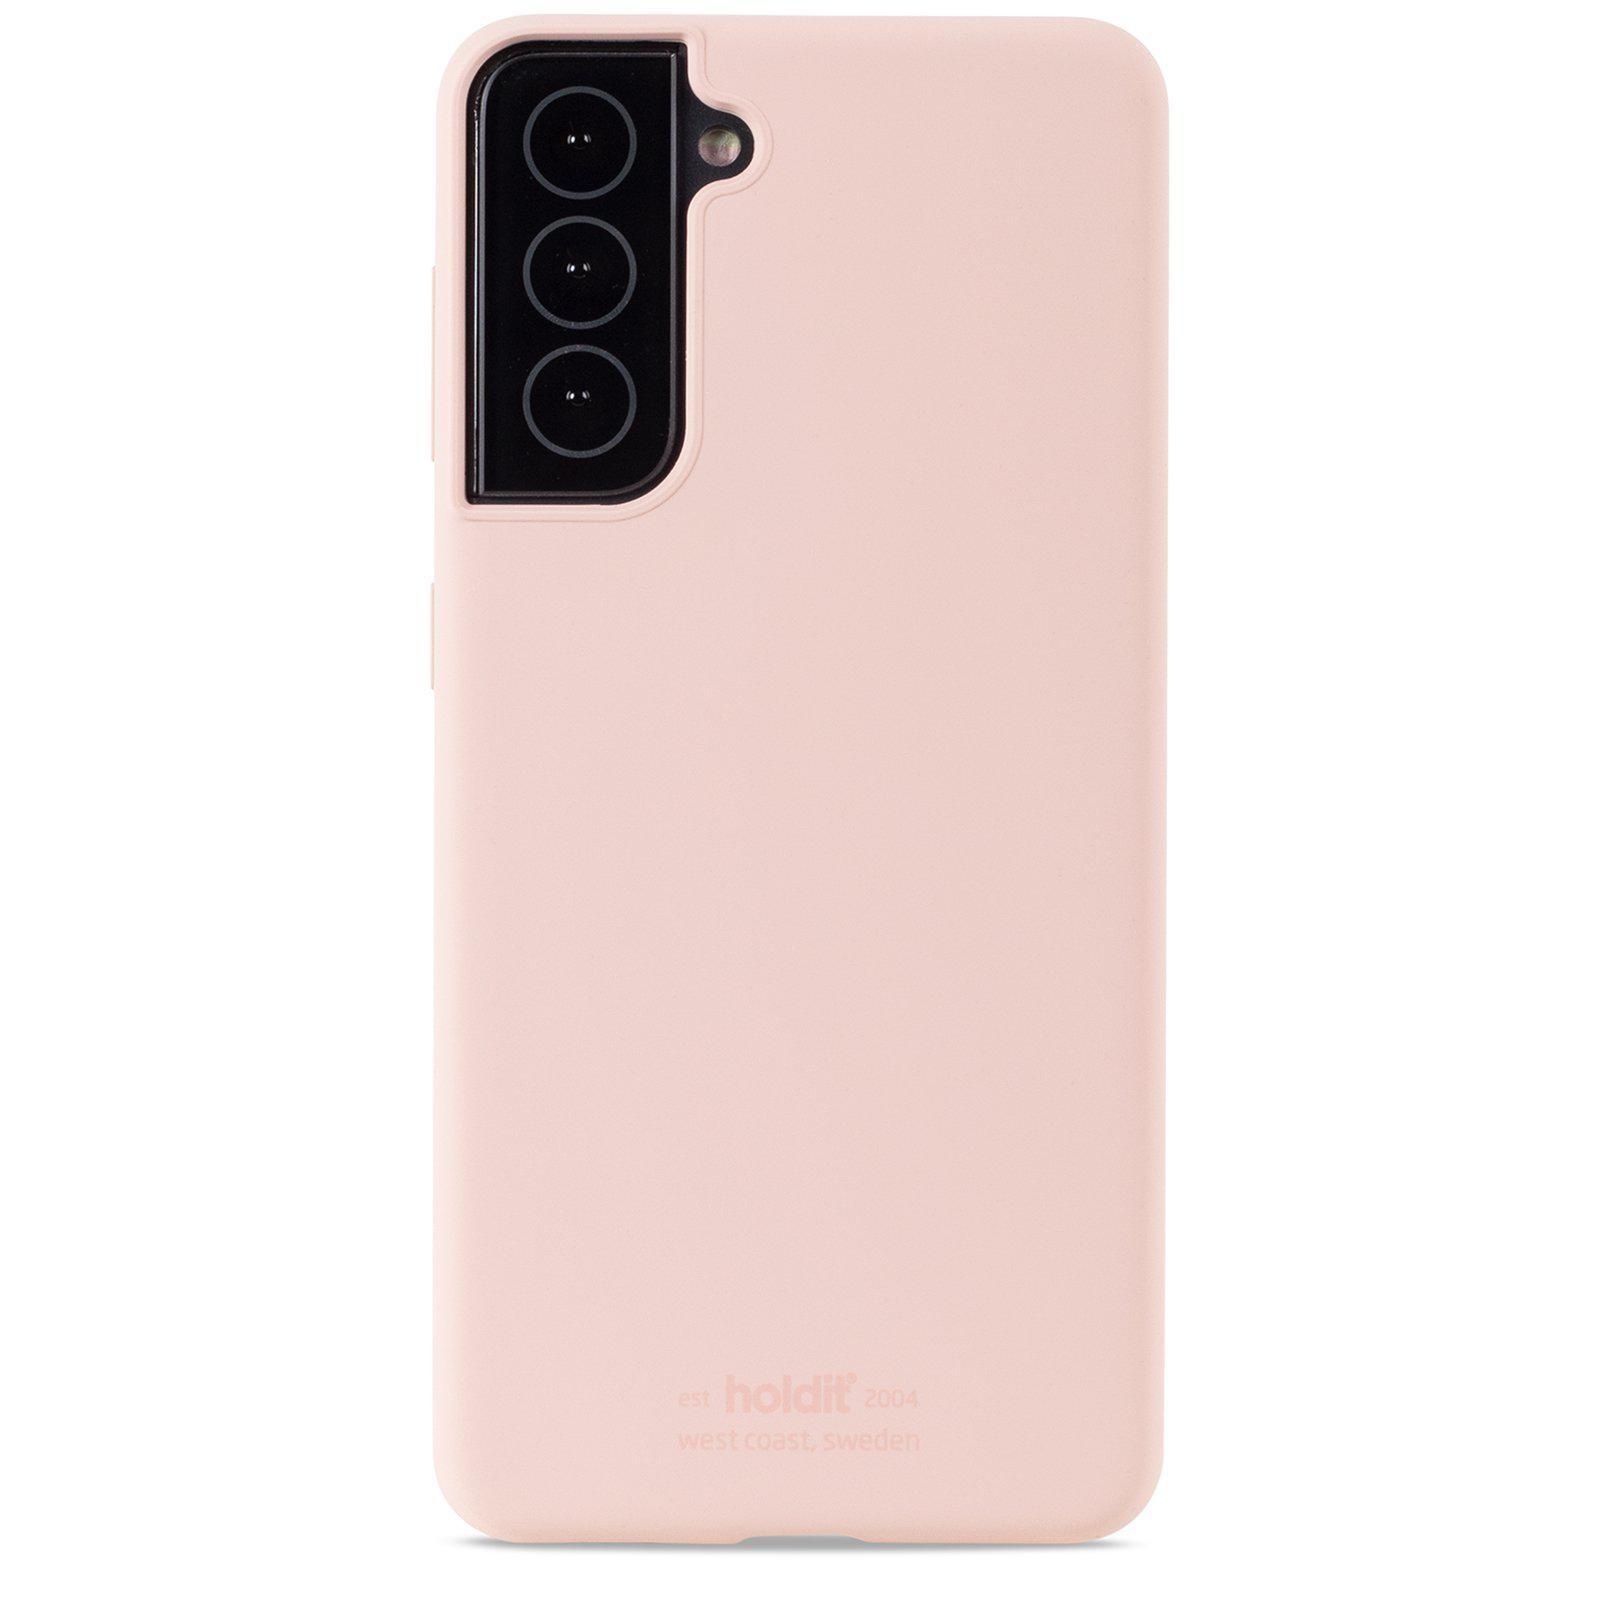 Silikonikuori Samsung Galaxy S21 Blush Pink